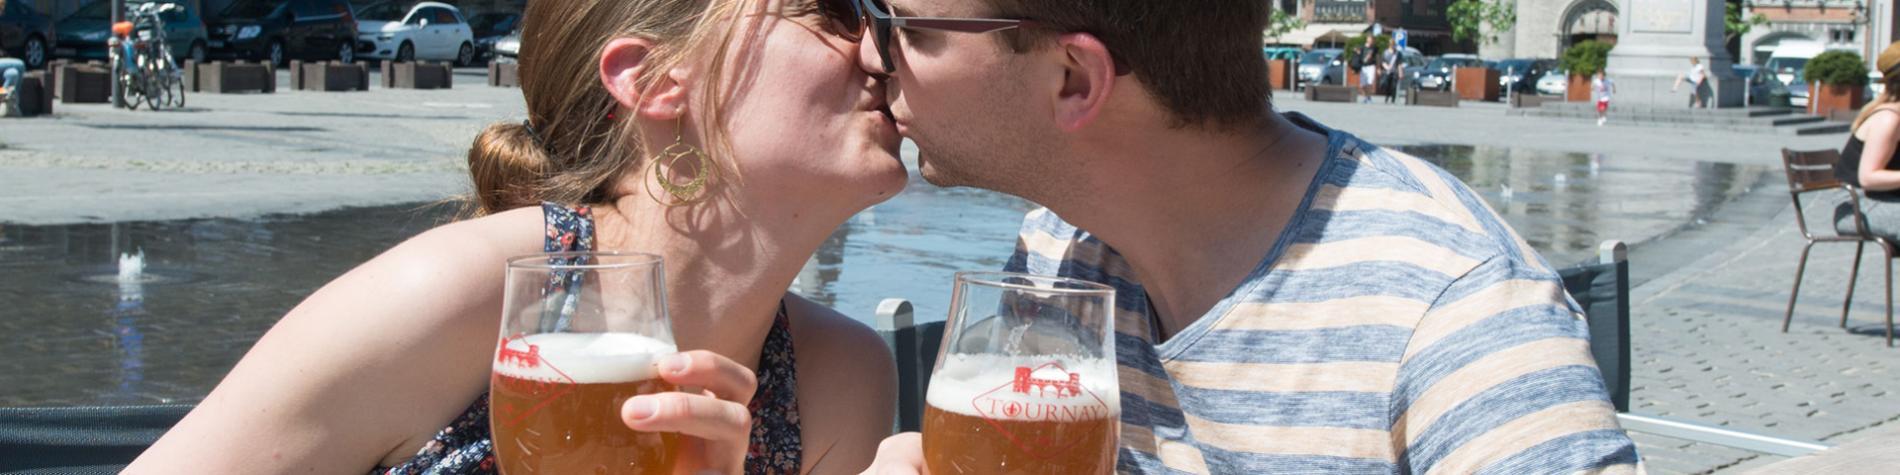 couple - grand-place - Tournai - terrasse - bière